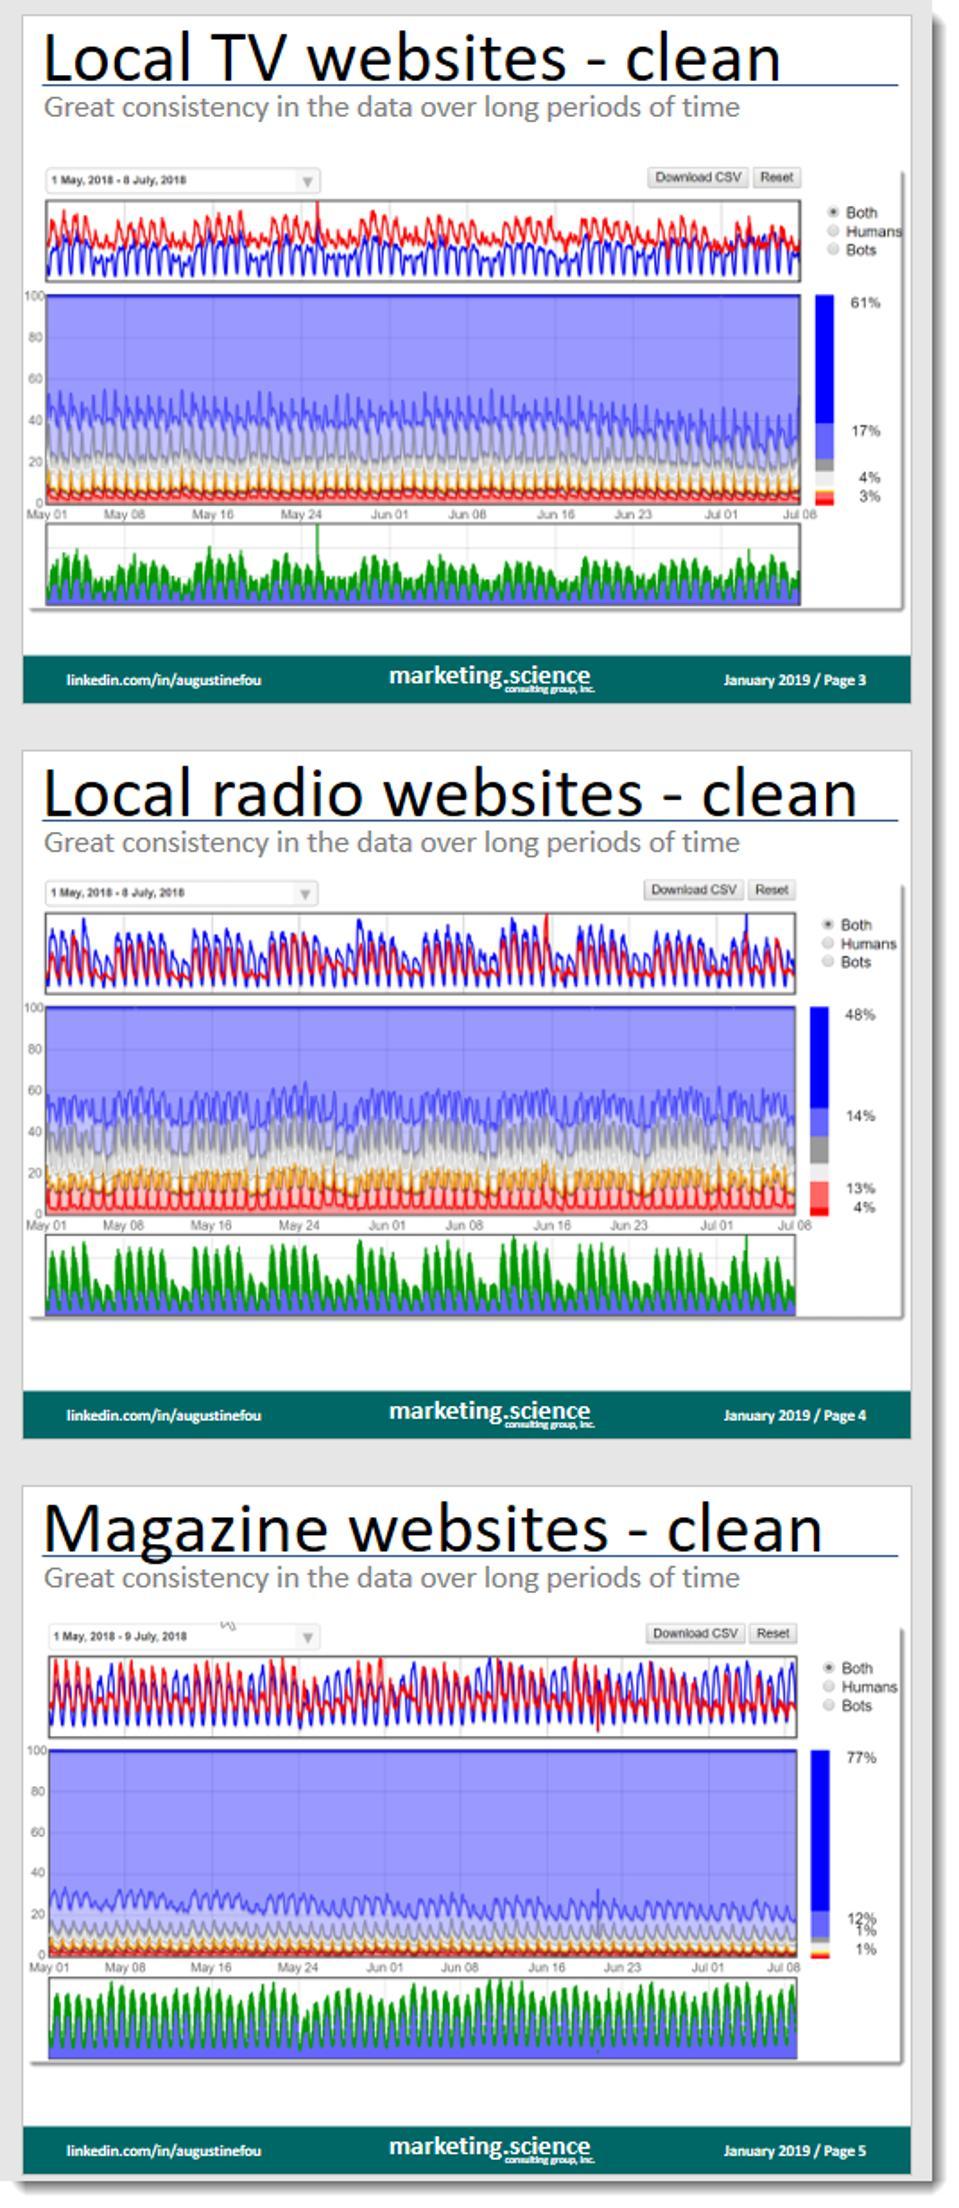 data on good publisher websites